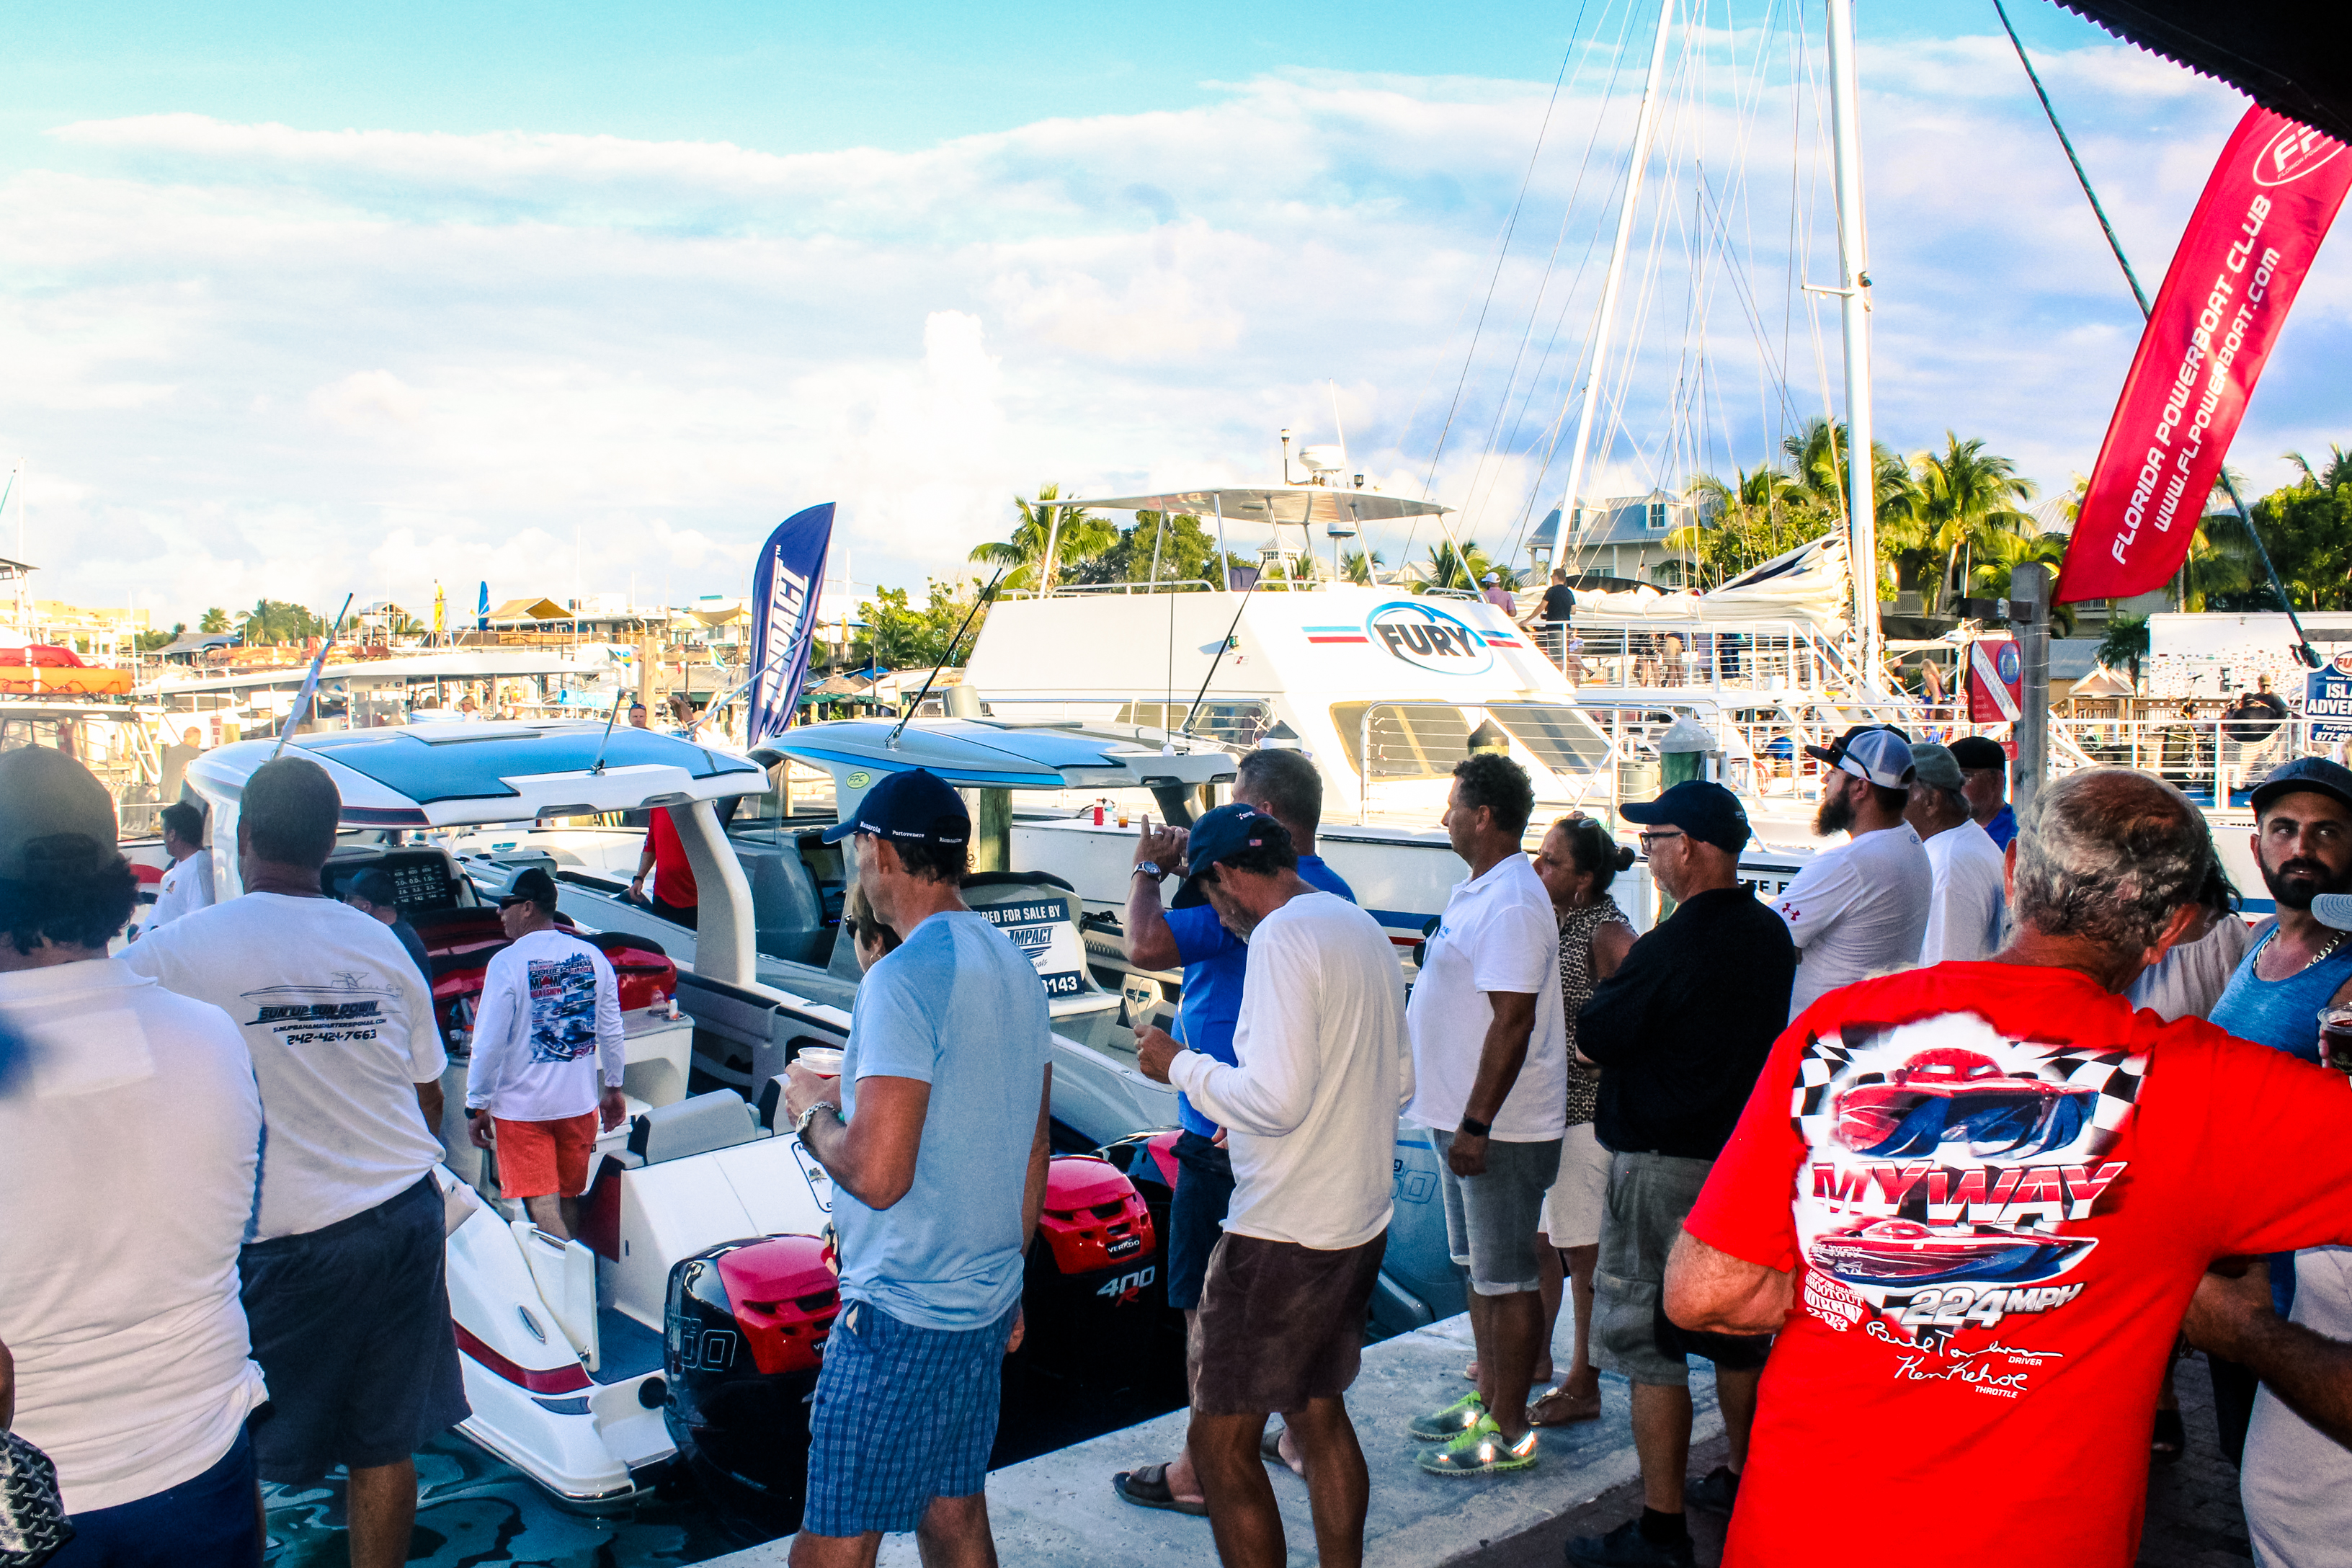 13 conch waterfront.jpg